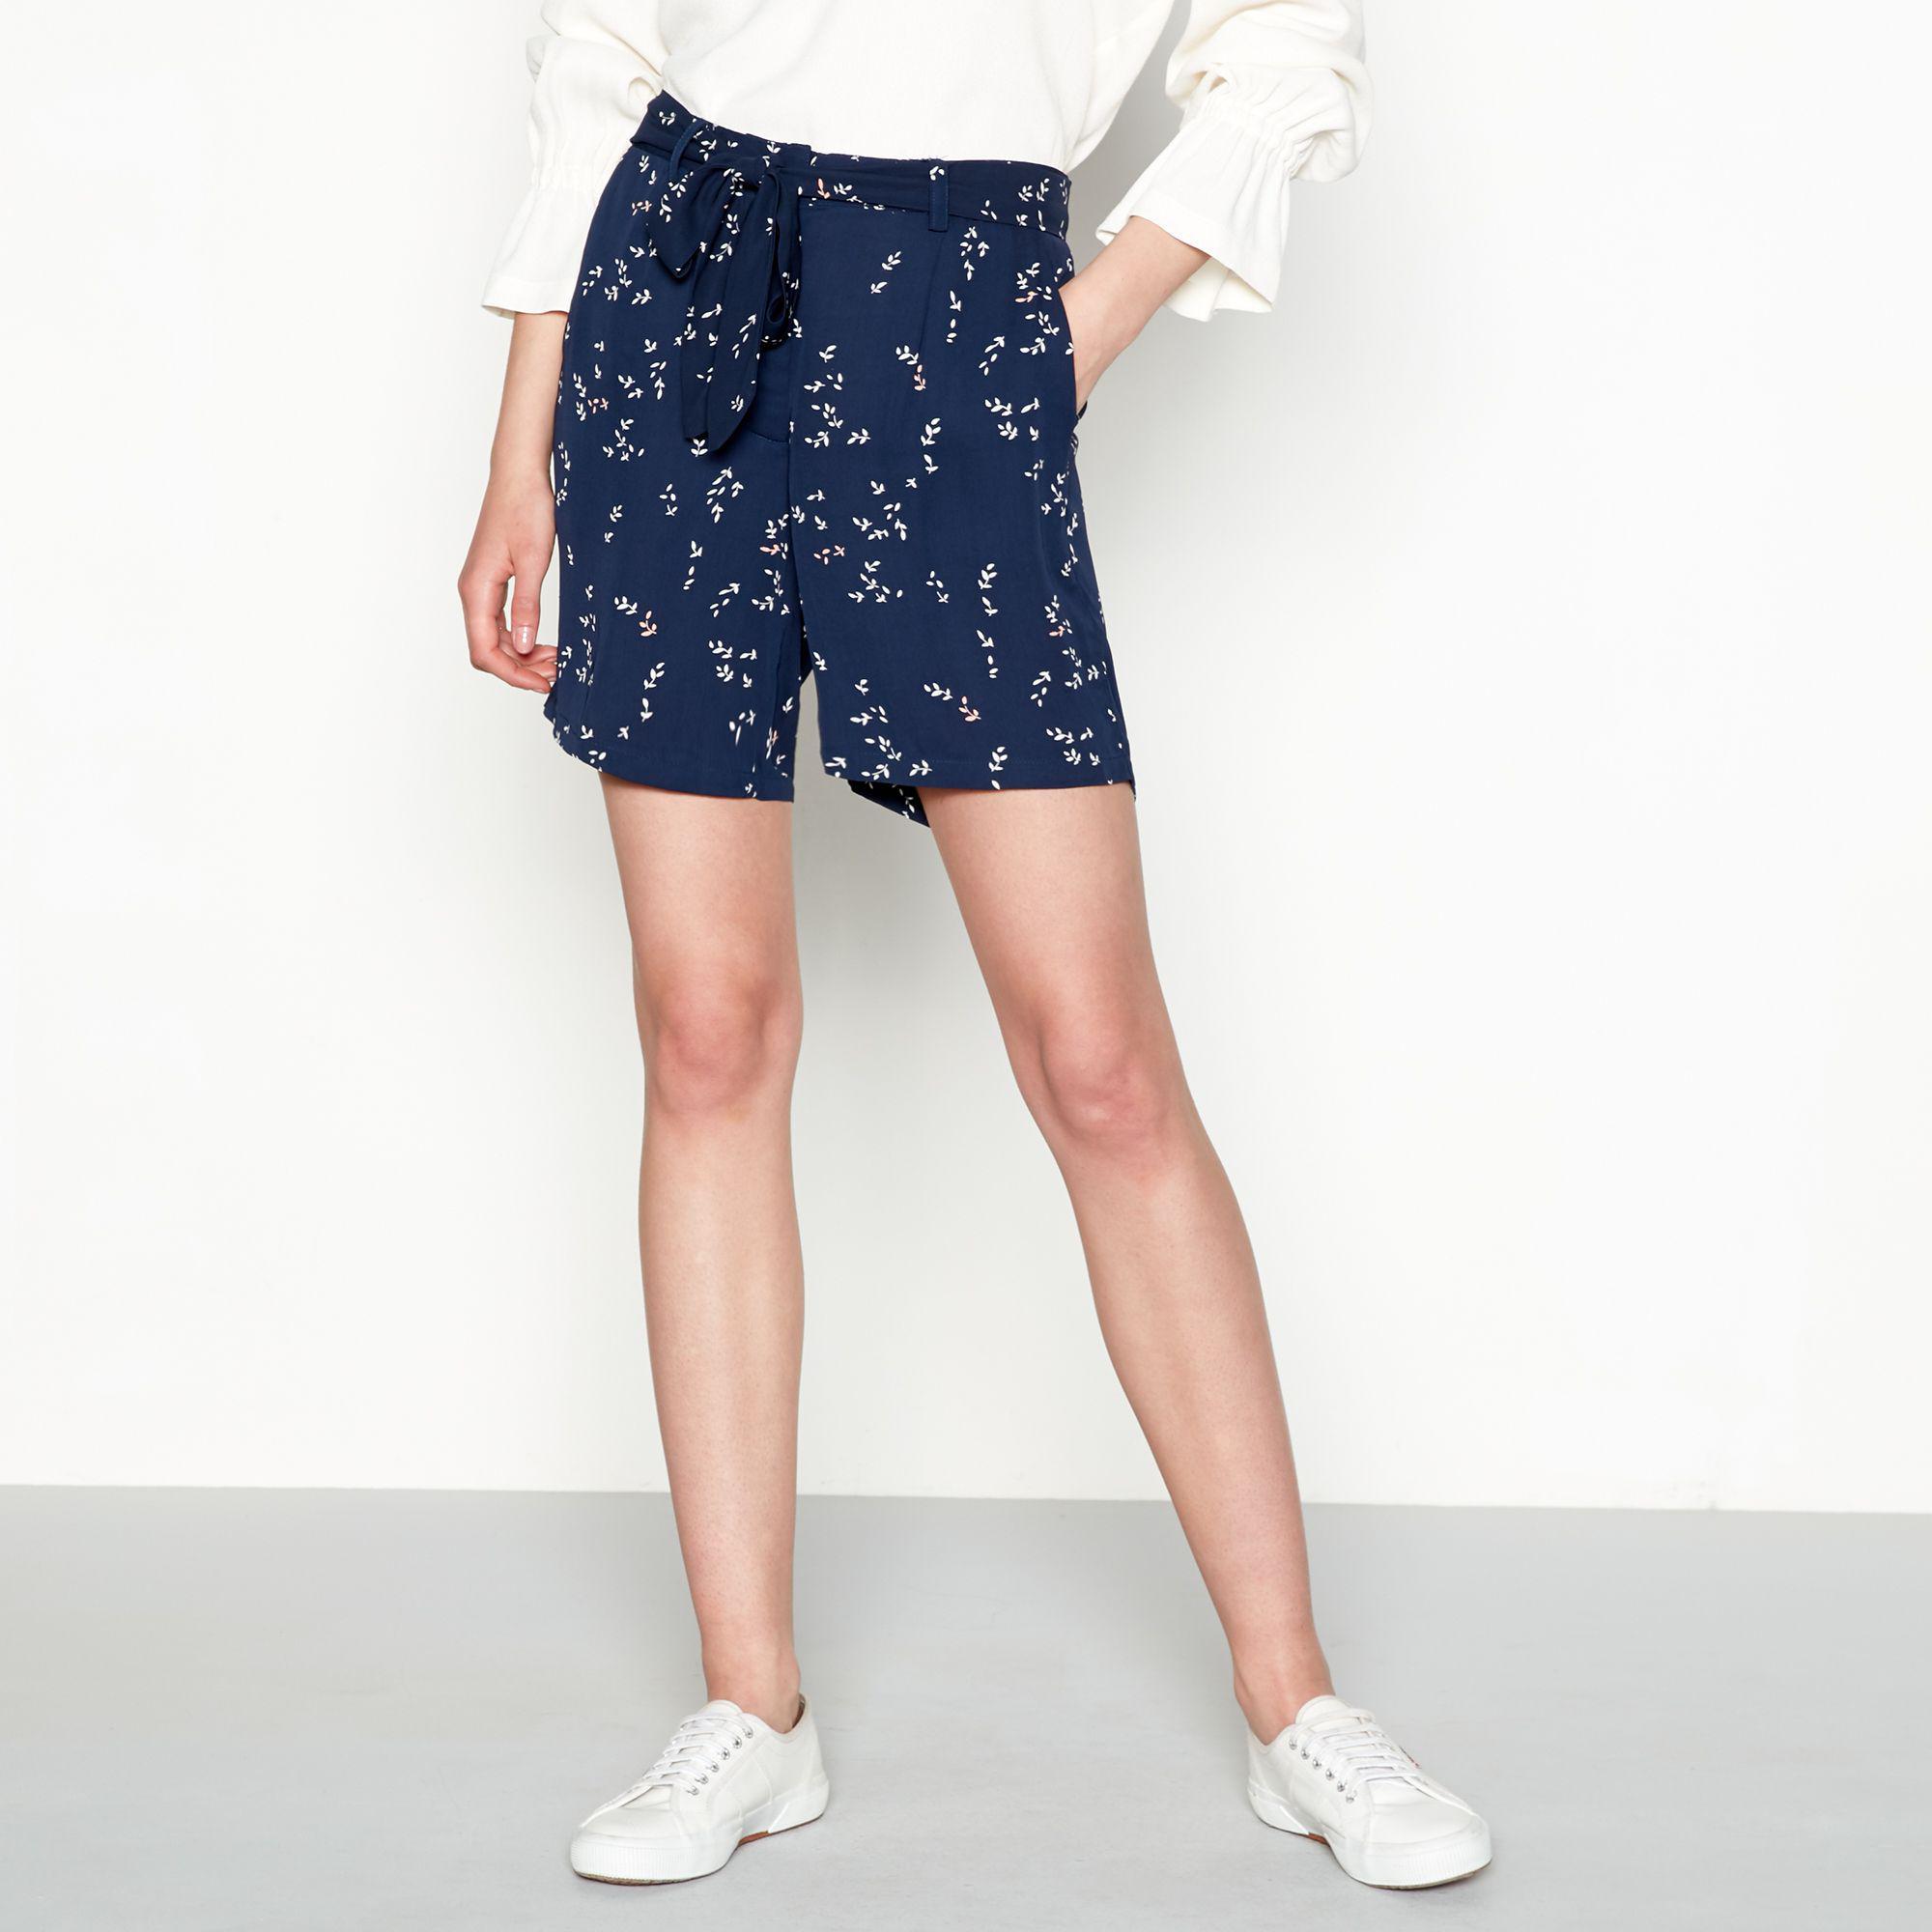 b552b32e7 Minimum Navy Leaf Print Chiffon 'bergliot' Loose Fit Shorts in Blue ...